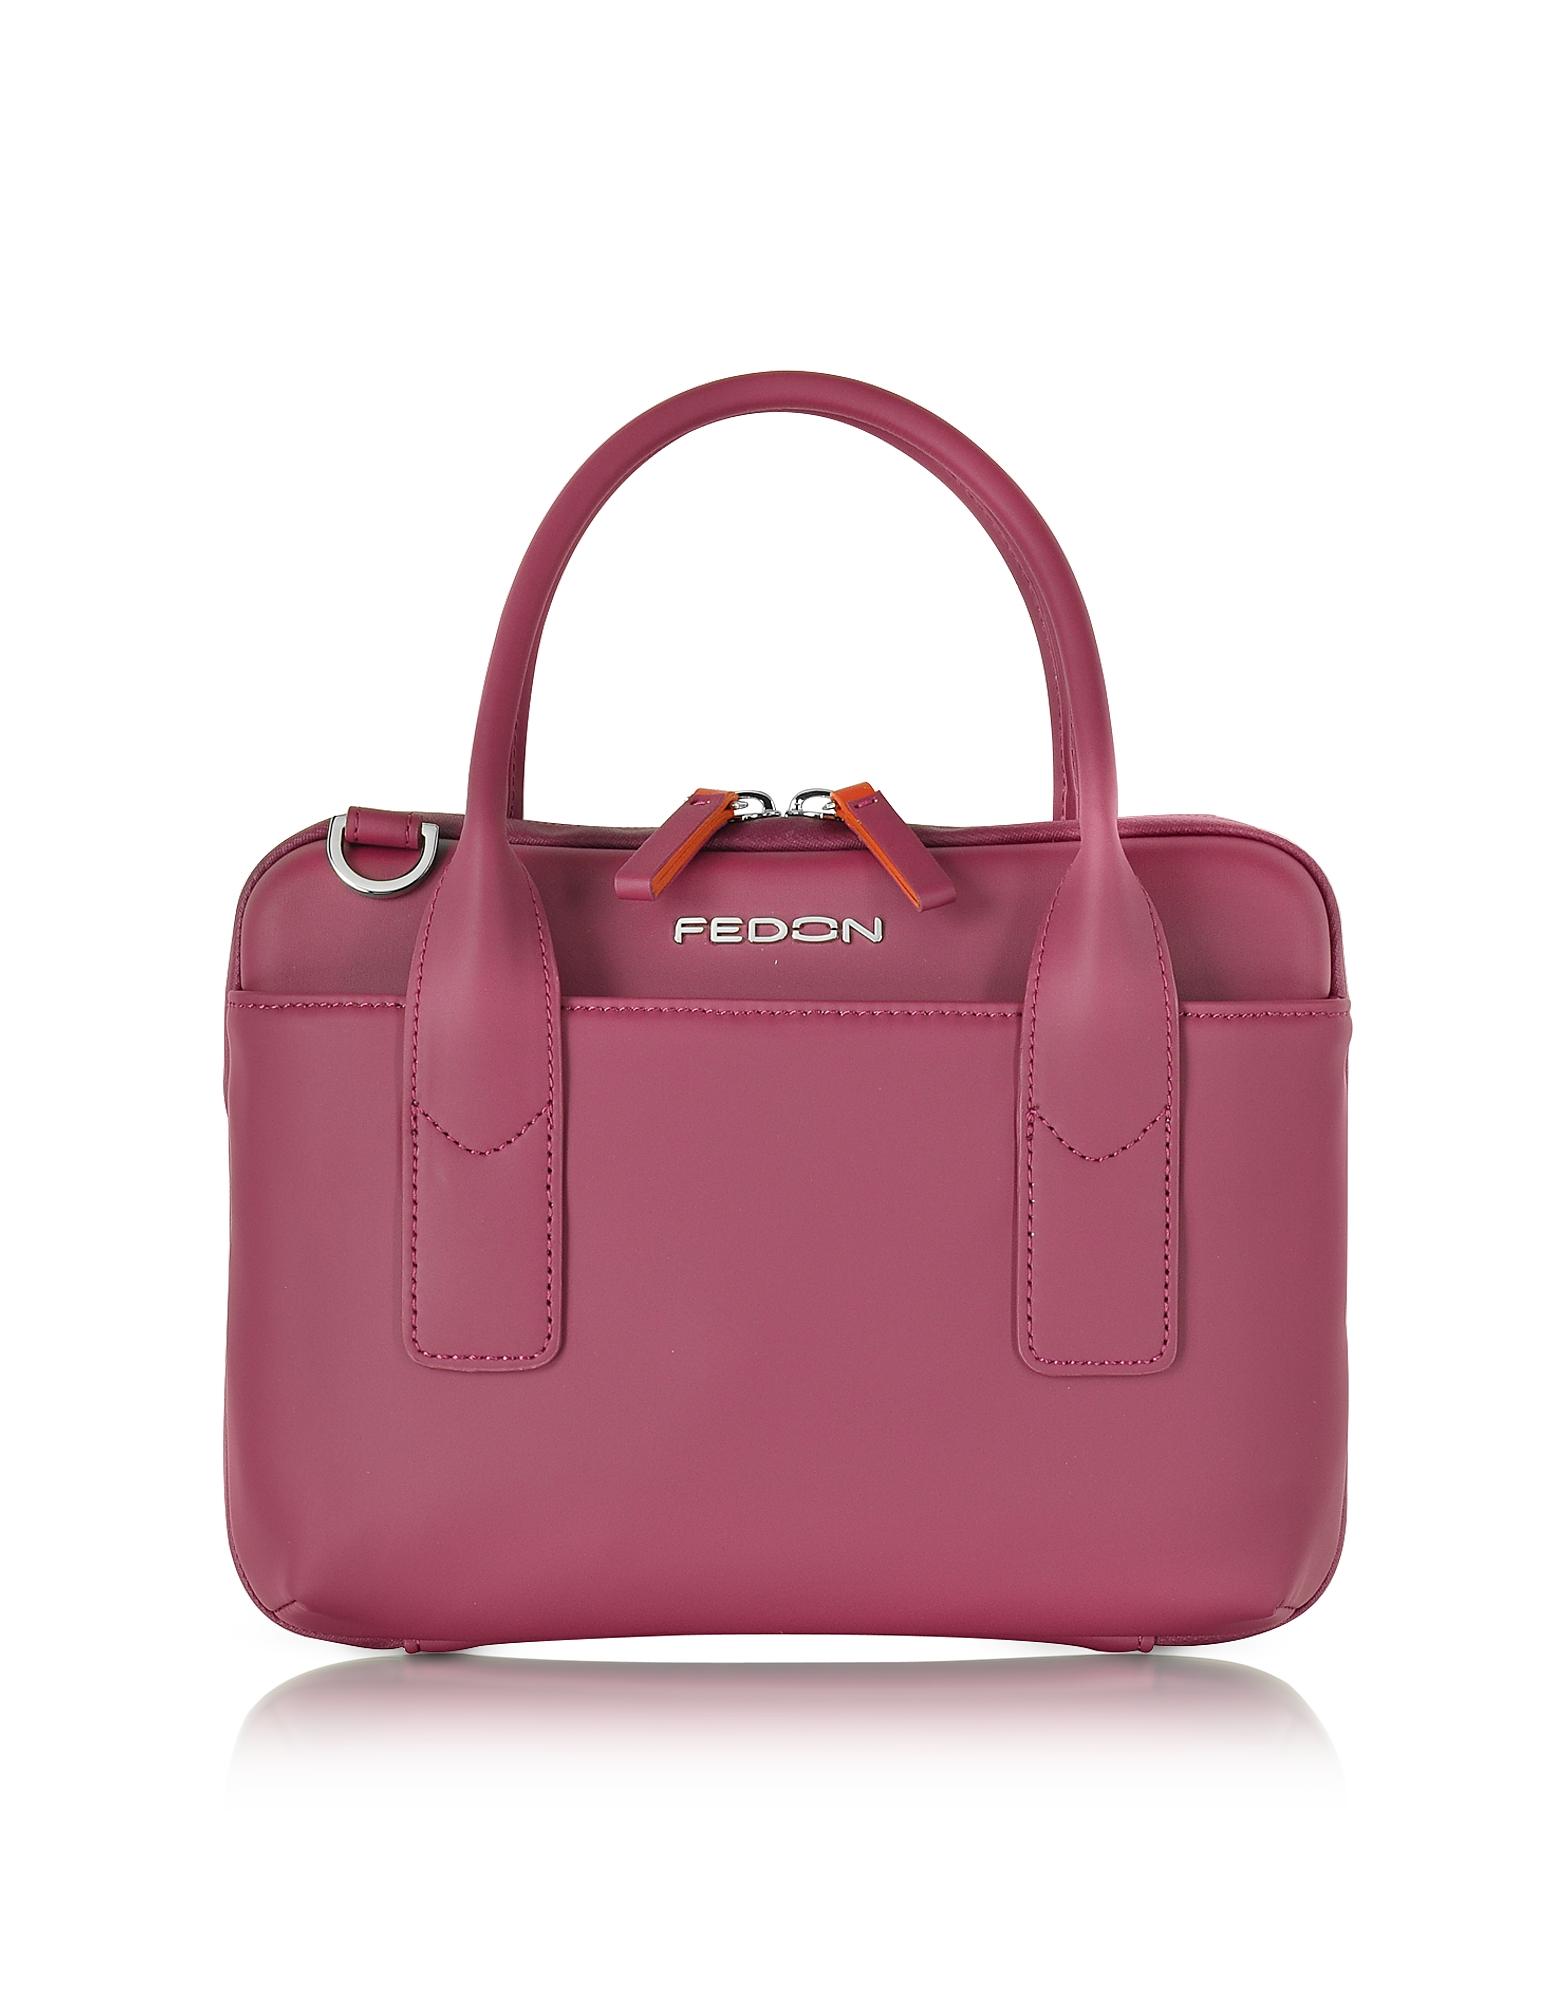 Giorgio Fedon 1919 Handbags, Bubble Double Handles Mini Bag w/Shoulder Strap